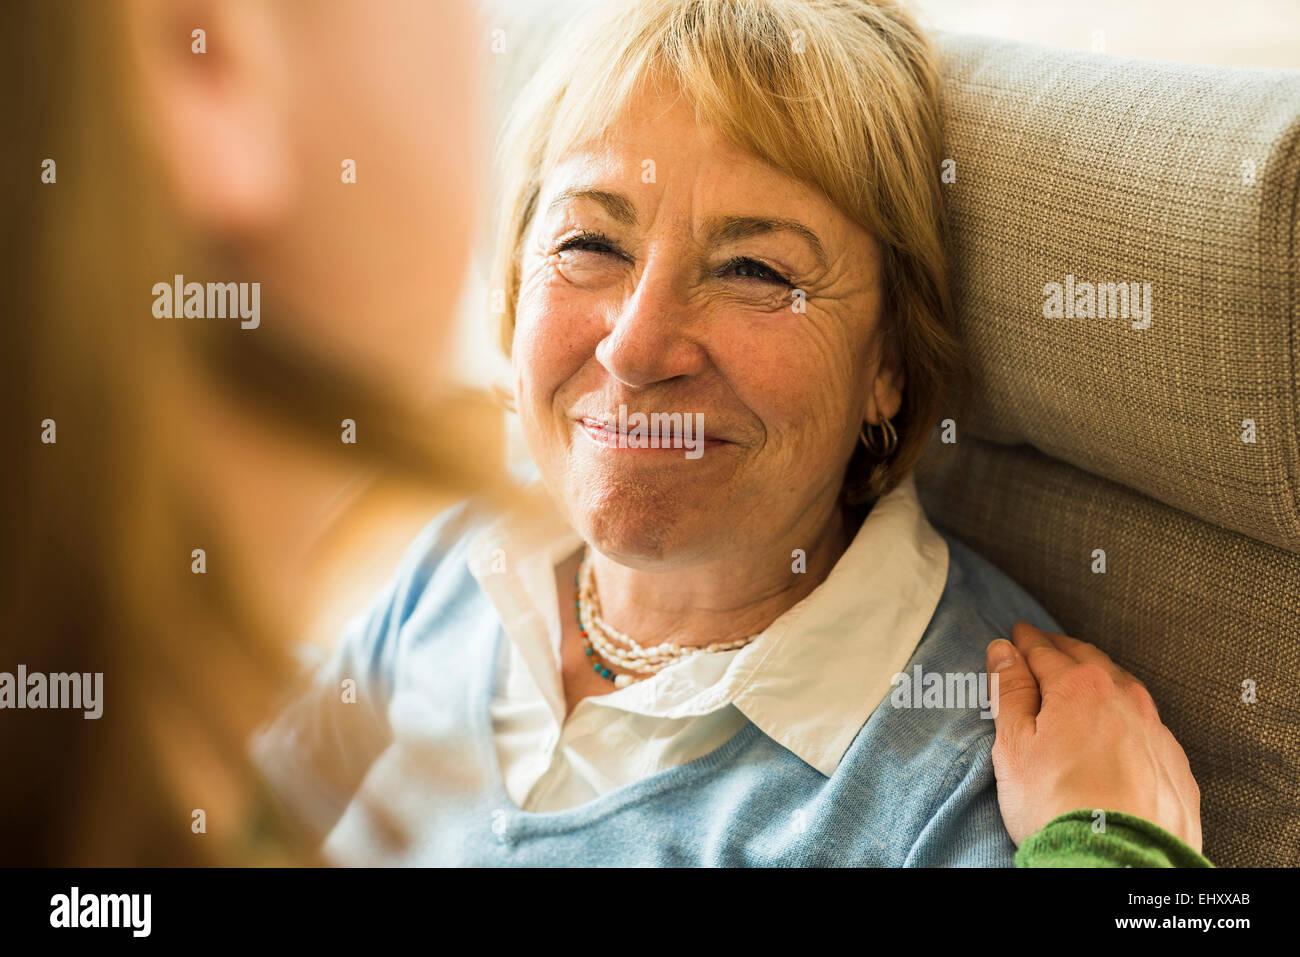 Lächelnden Großmutter Erwachsenen Enkelin betrachten Stockbild